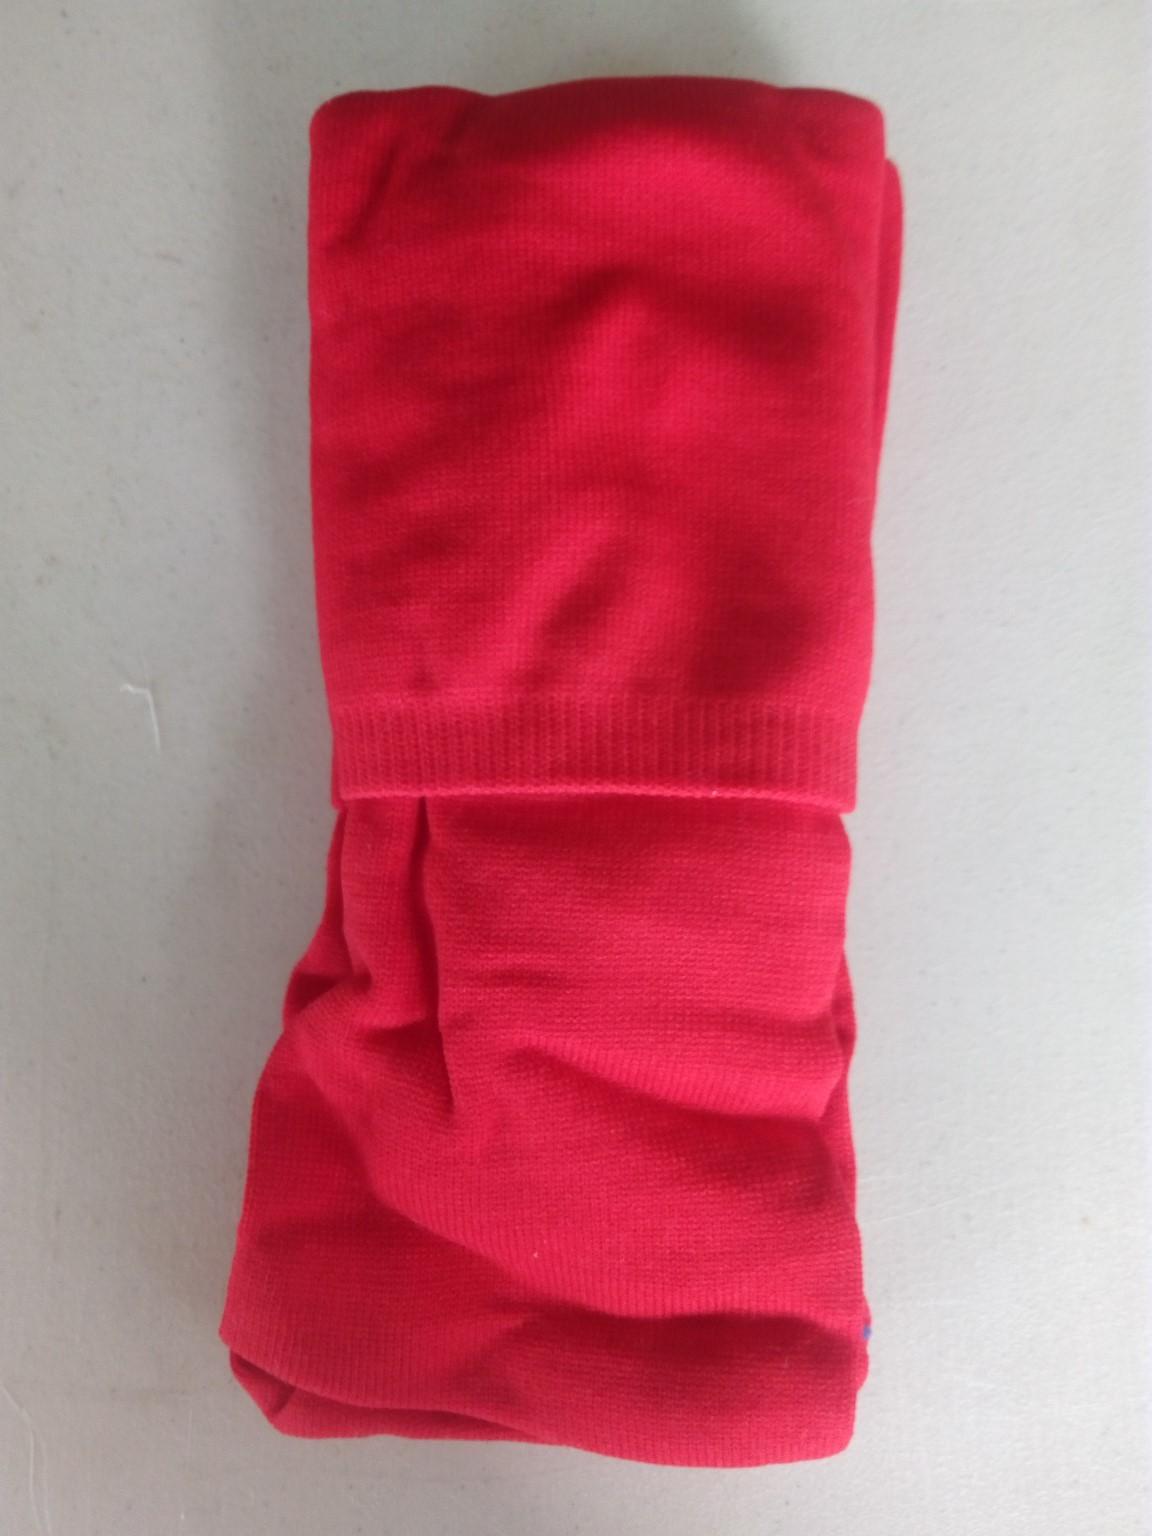 Socks $15